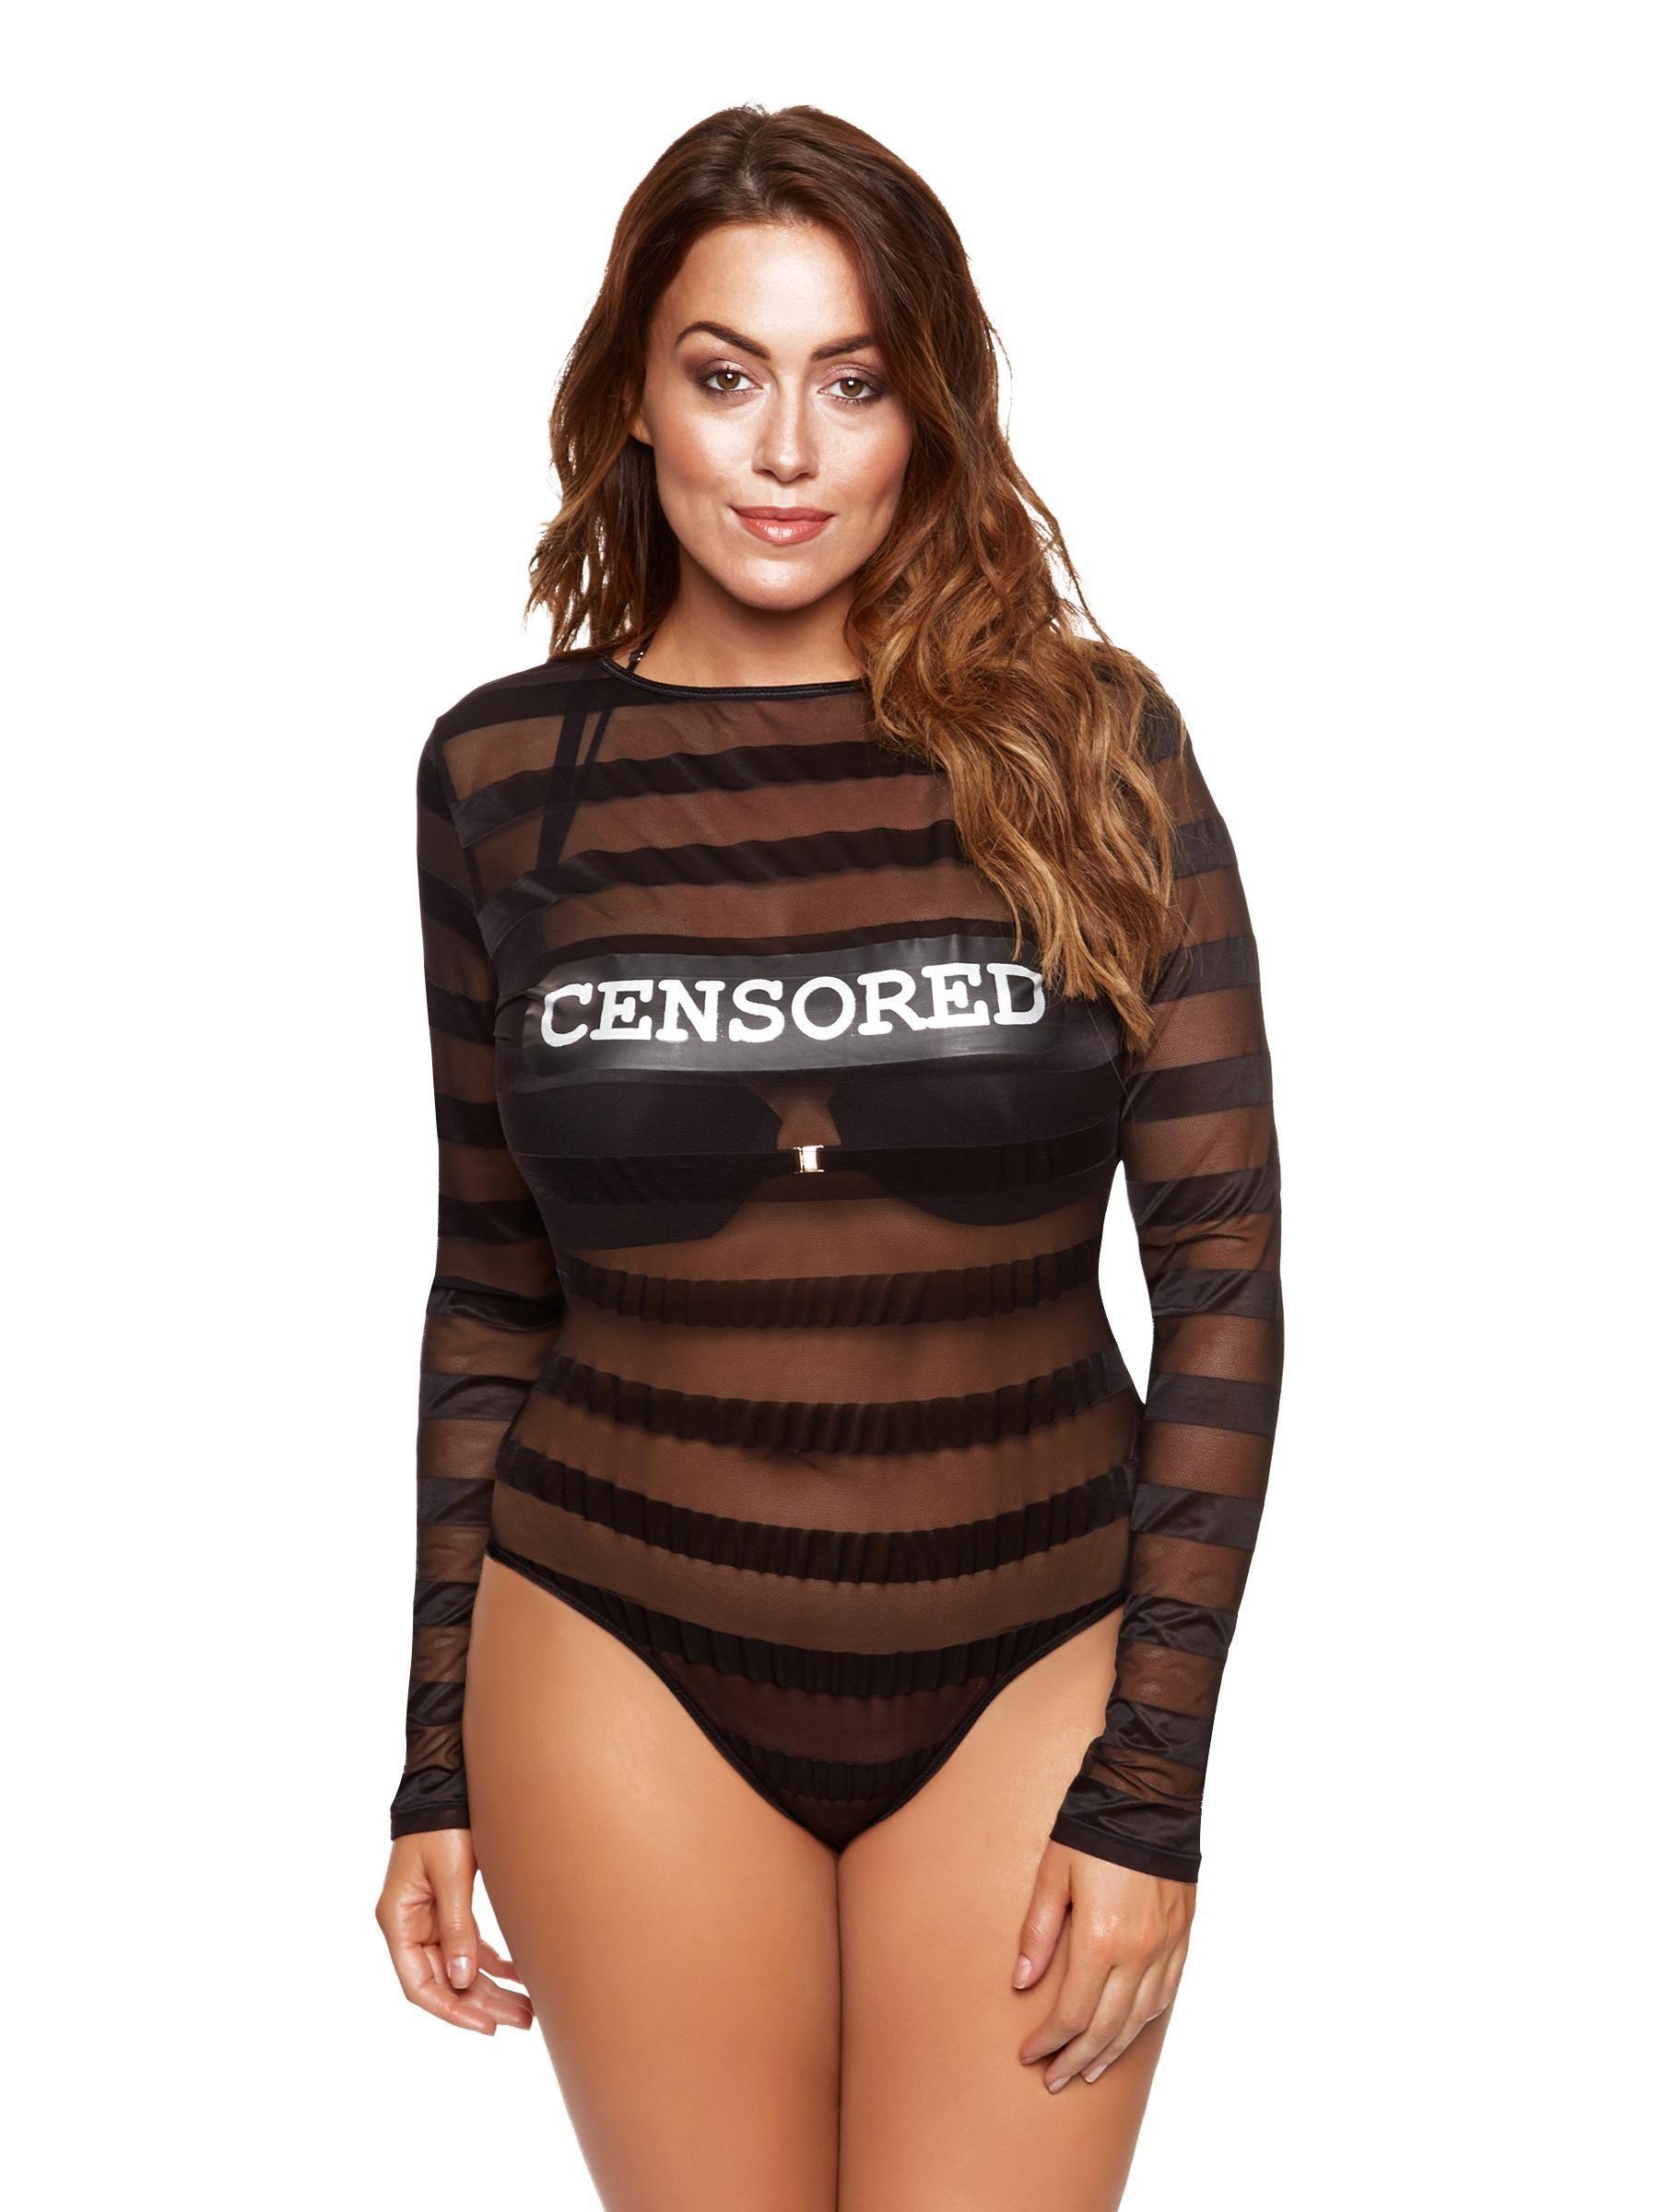 ef3798593948e Censored Body - Ann Summers | Laura Goodwin | Sexy, Ann summers ...